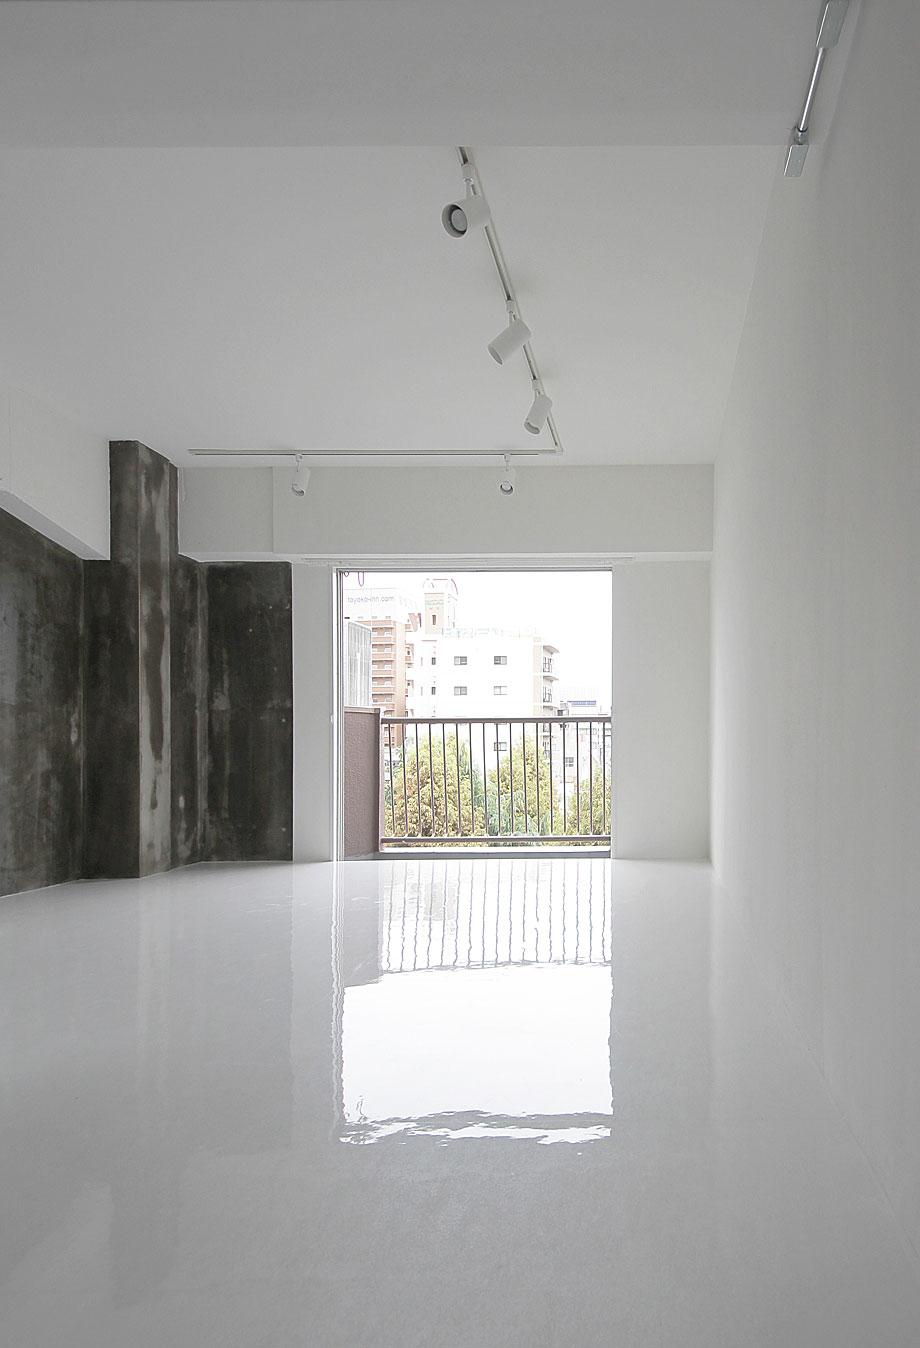 apartamento-osaka-japon-jun-murata-16